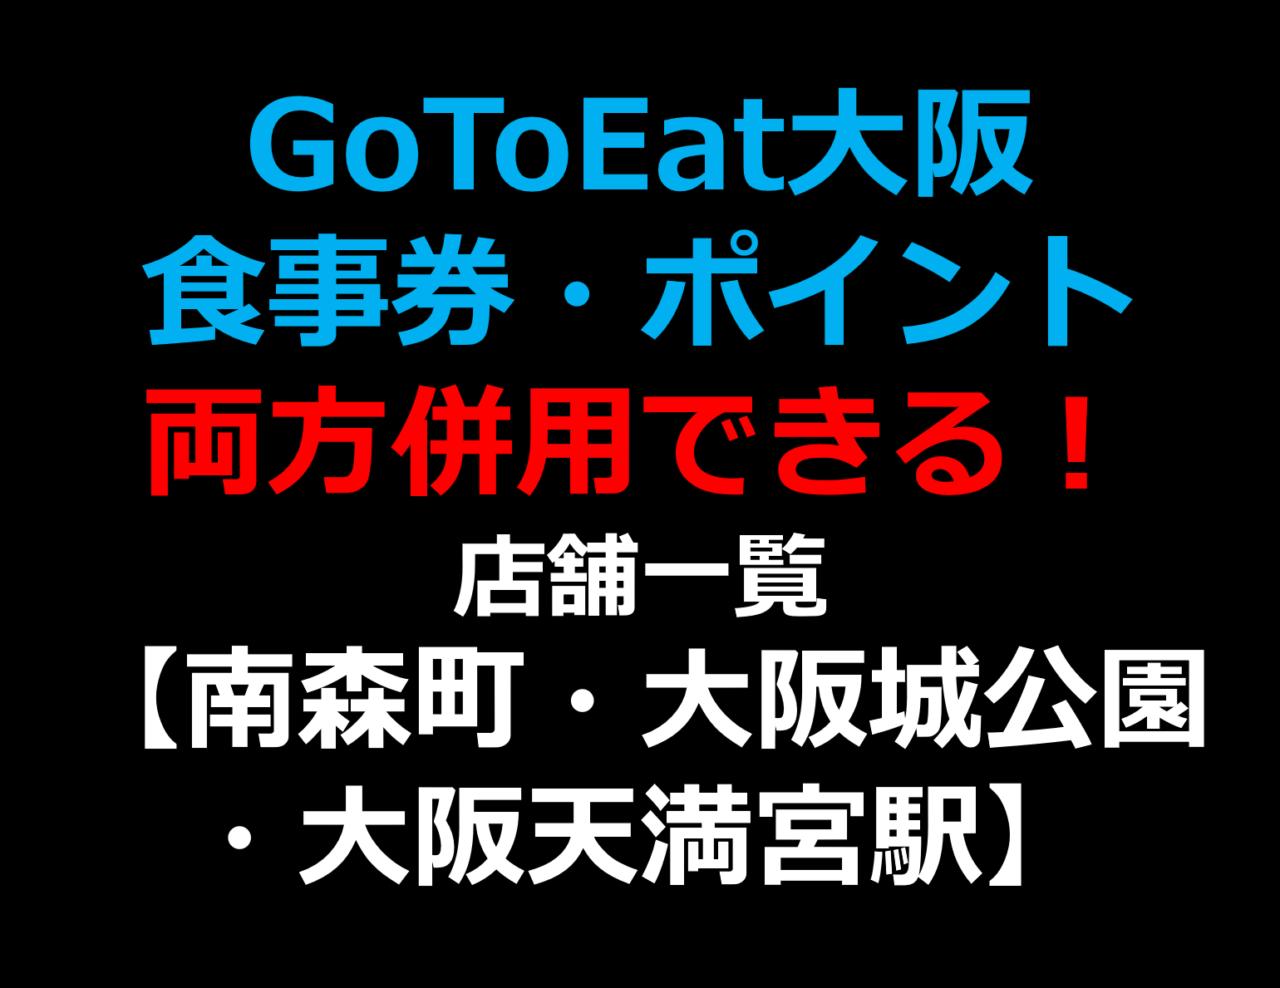 GoToEat大阪で食事券・予約サイトのポイント両方併用できる!使える!店舗一覧 【南森町,大阪城公園,大阪天満宮駅】